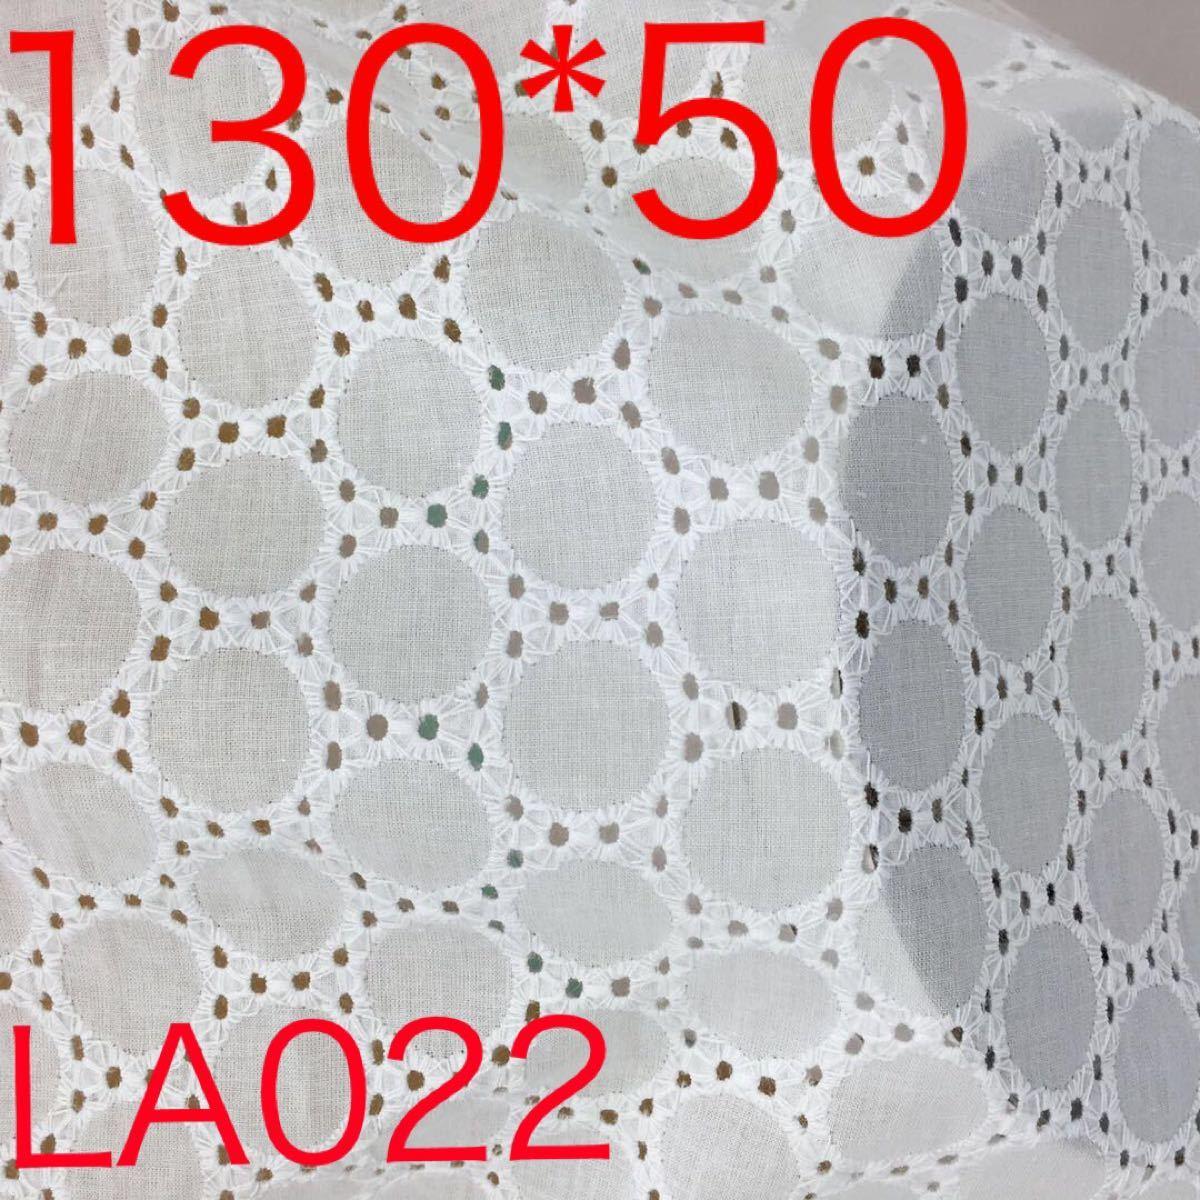 綿レース生地130cm*50cm (LA022)